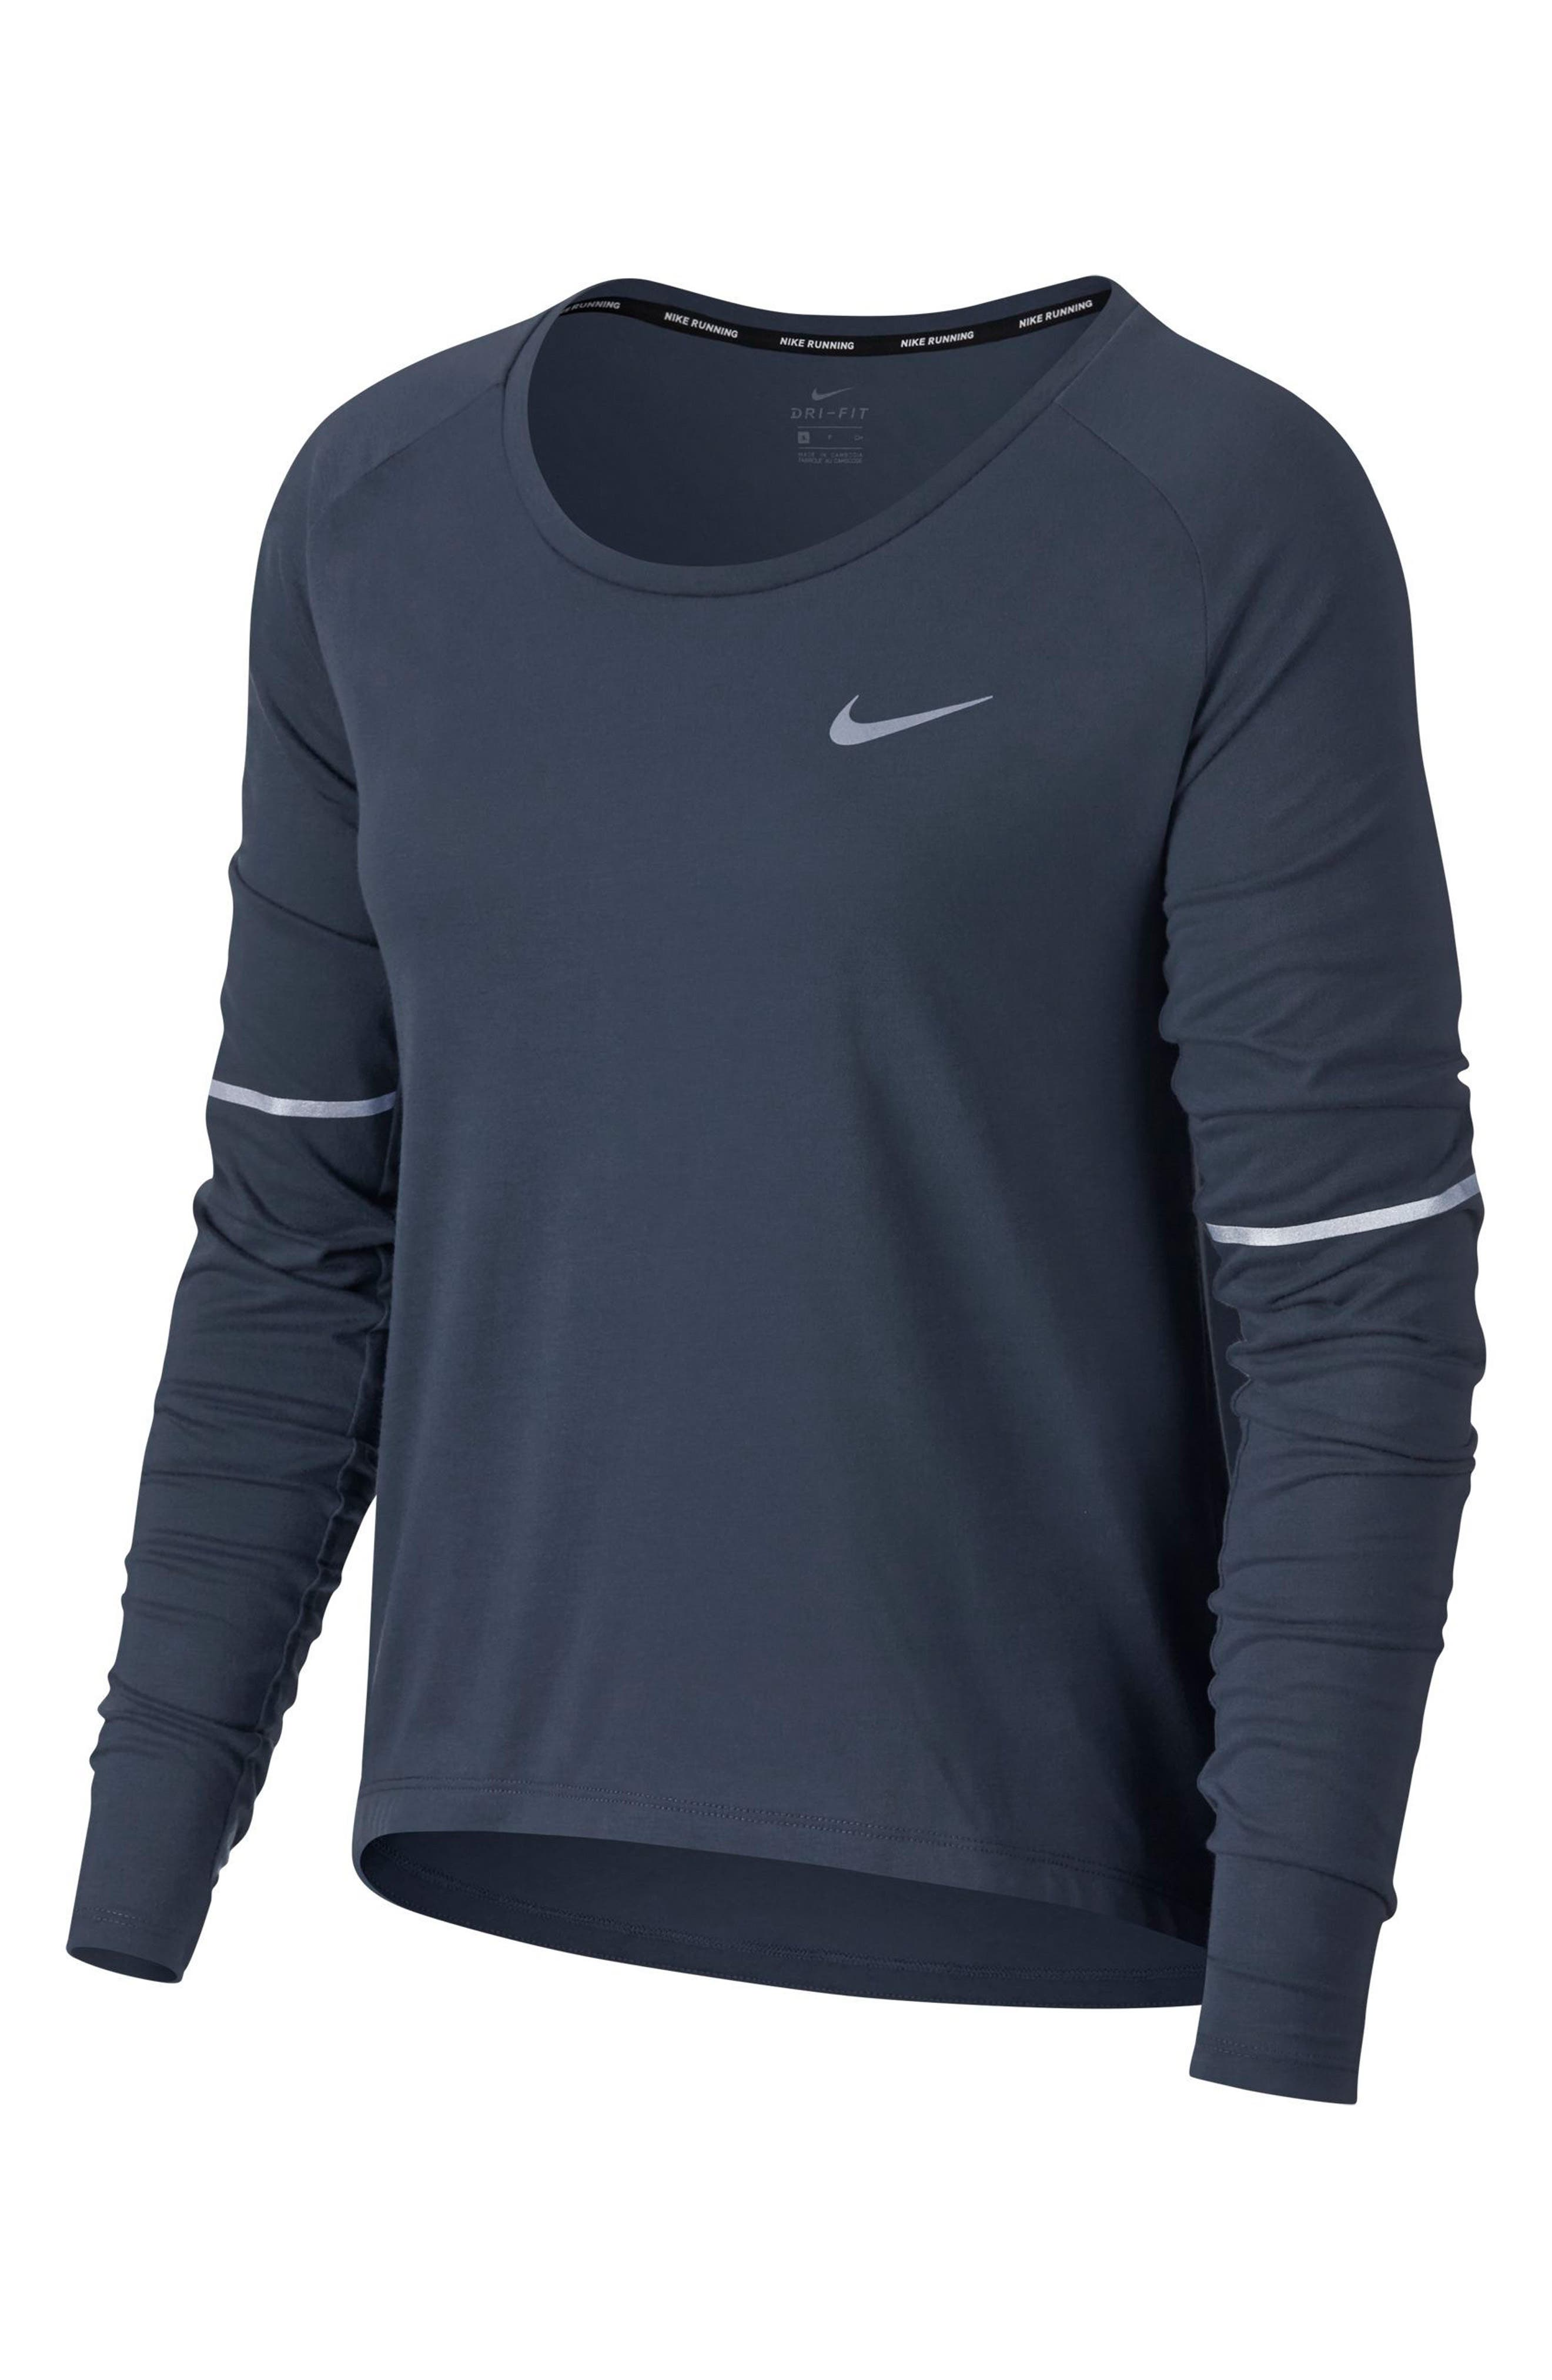 Nike Breathe Women's Running Top